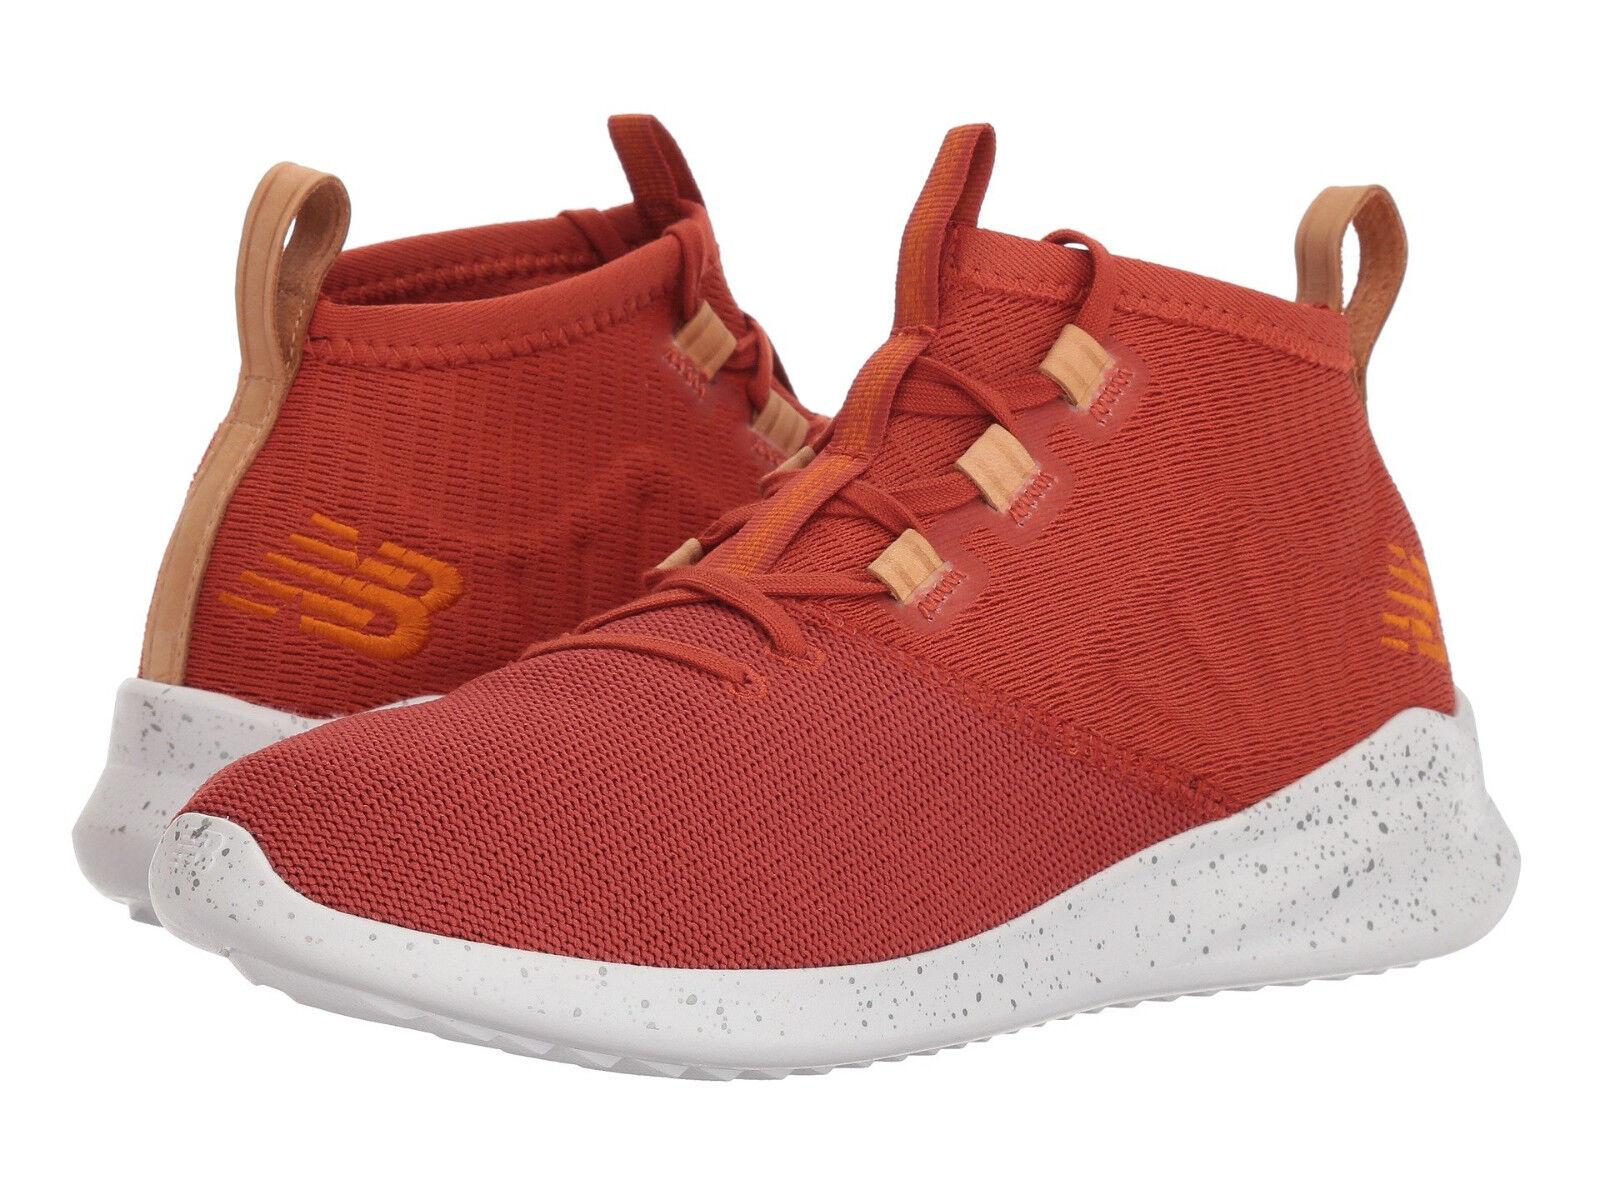 New Balance Men's Cypher Sz US 14 D Russet Mesh Running Sneakers shoes